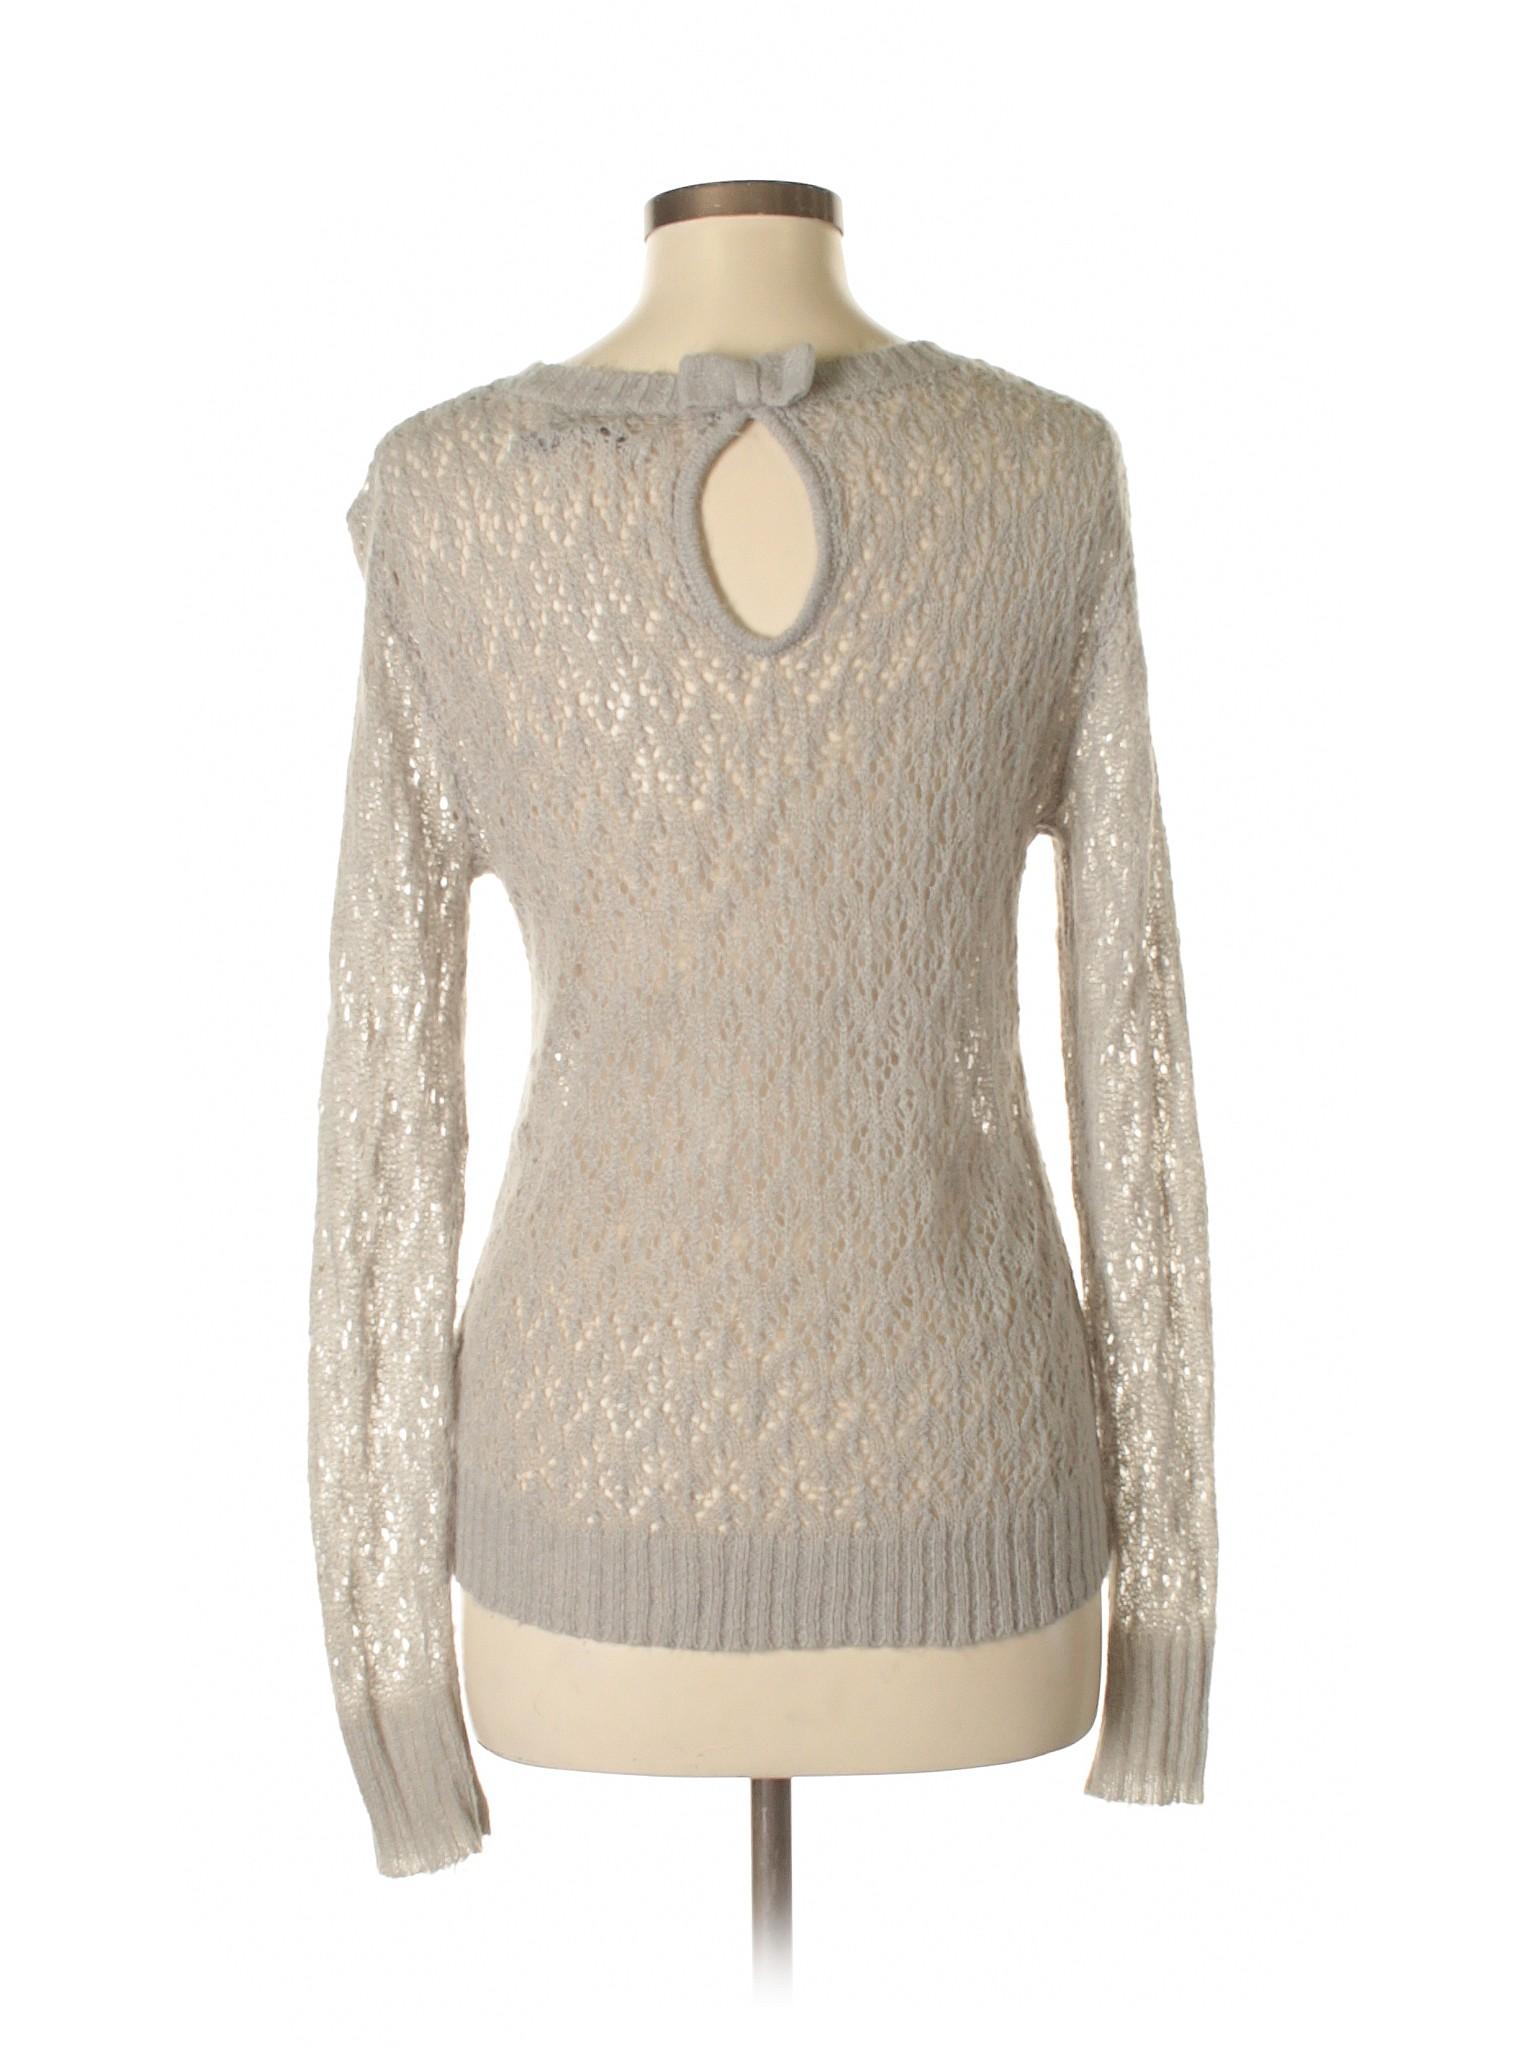 Conrad Pullover Sweater LC Lauren winter Boutique 6zfYt6